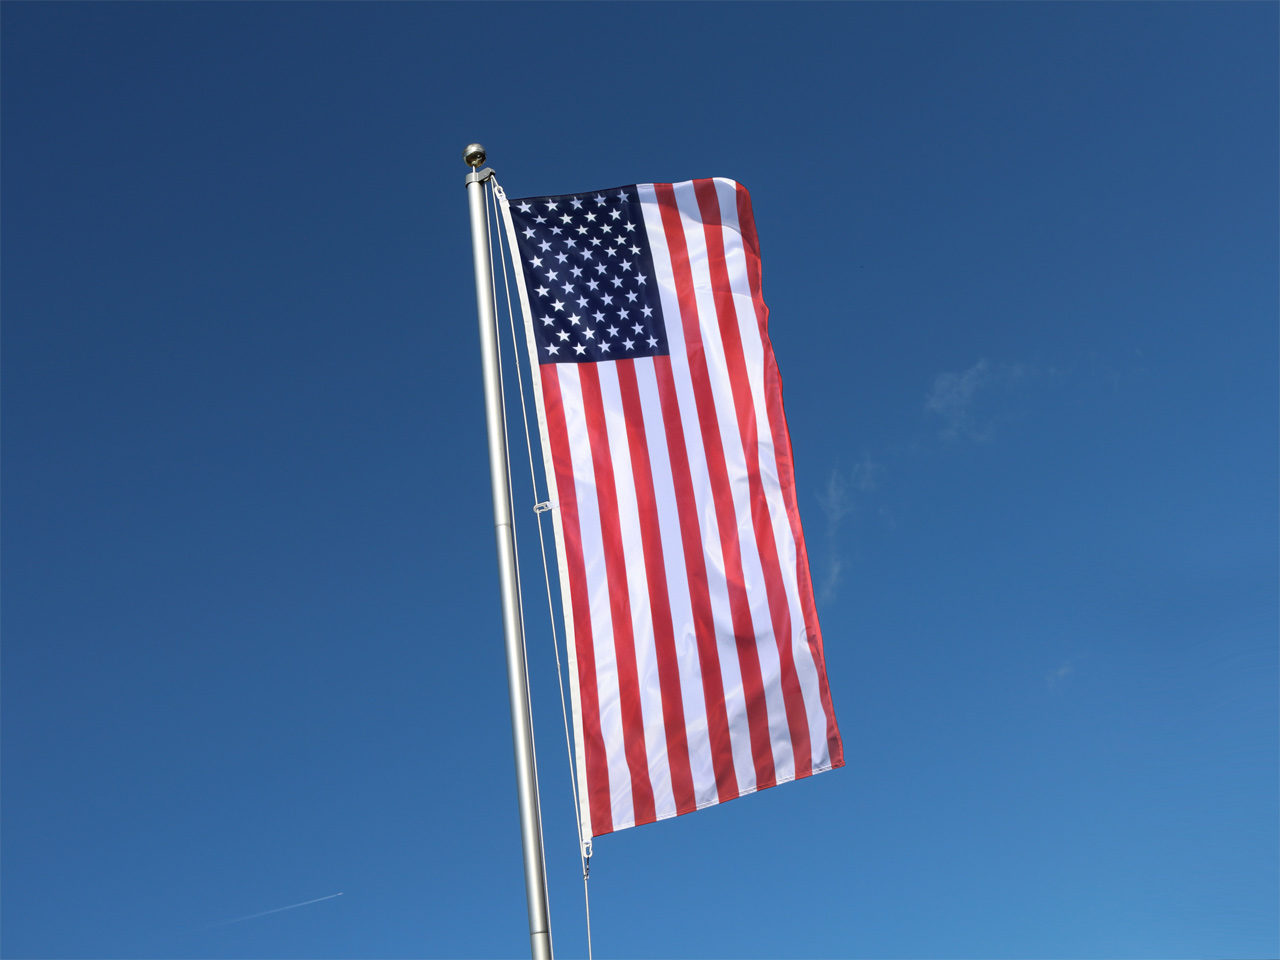 USA Flagge - Amerikanische Fahne kaufen - FlaggenPlatz.de Shop